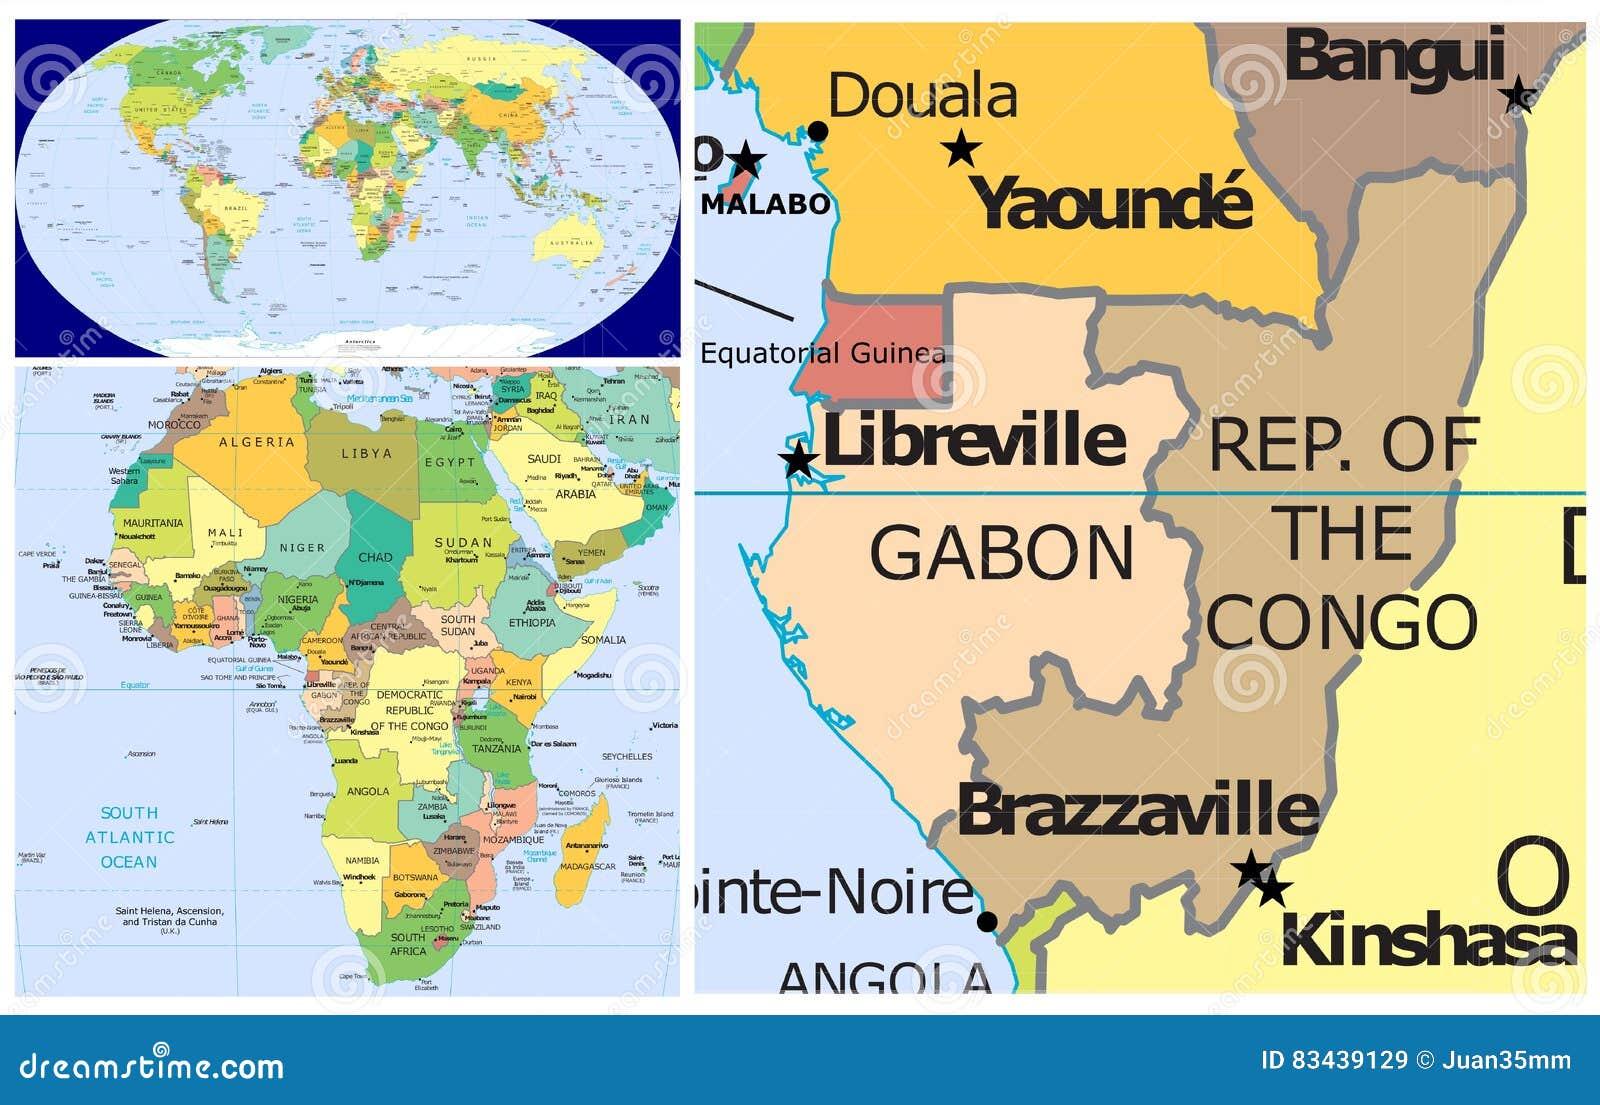 Gabon World Map.Gabon World Stock Illustration Illustration Of East 83439129